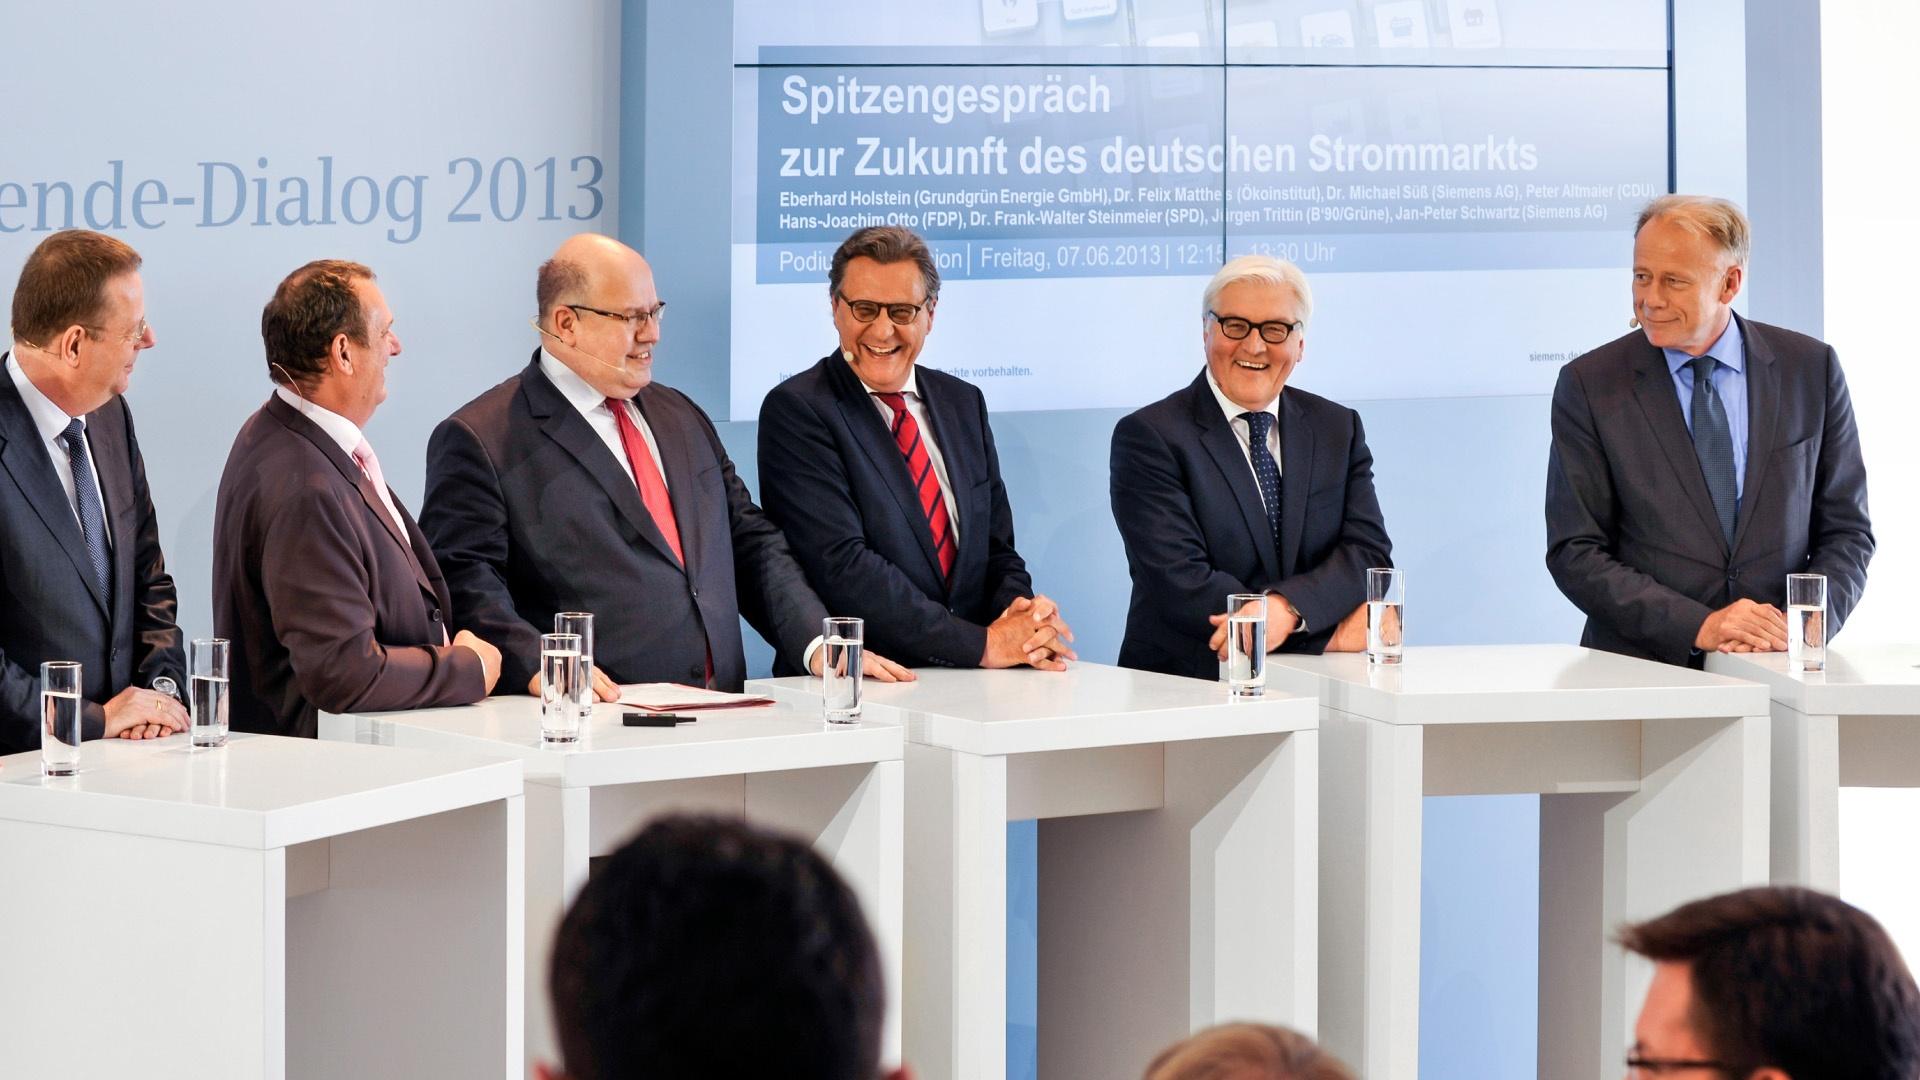 Podium Siemens Energiewende